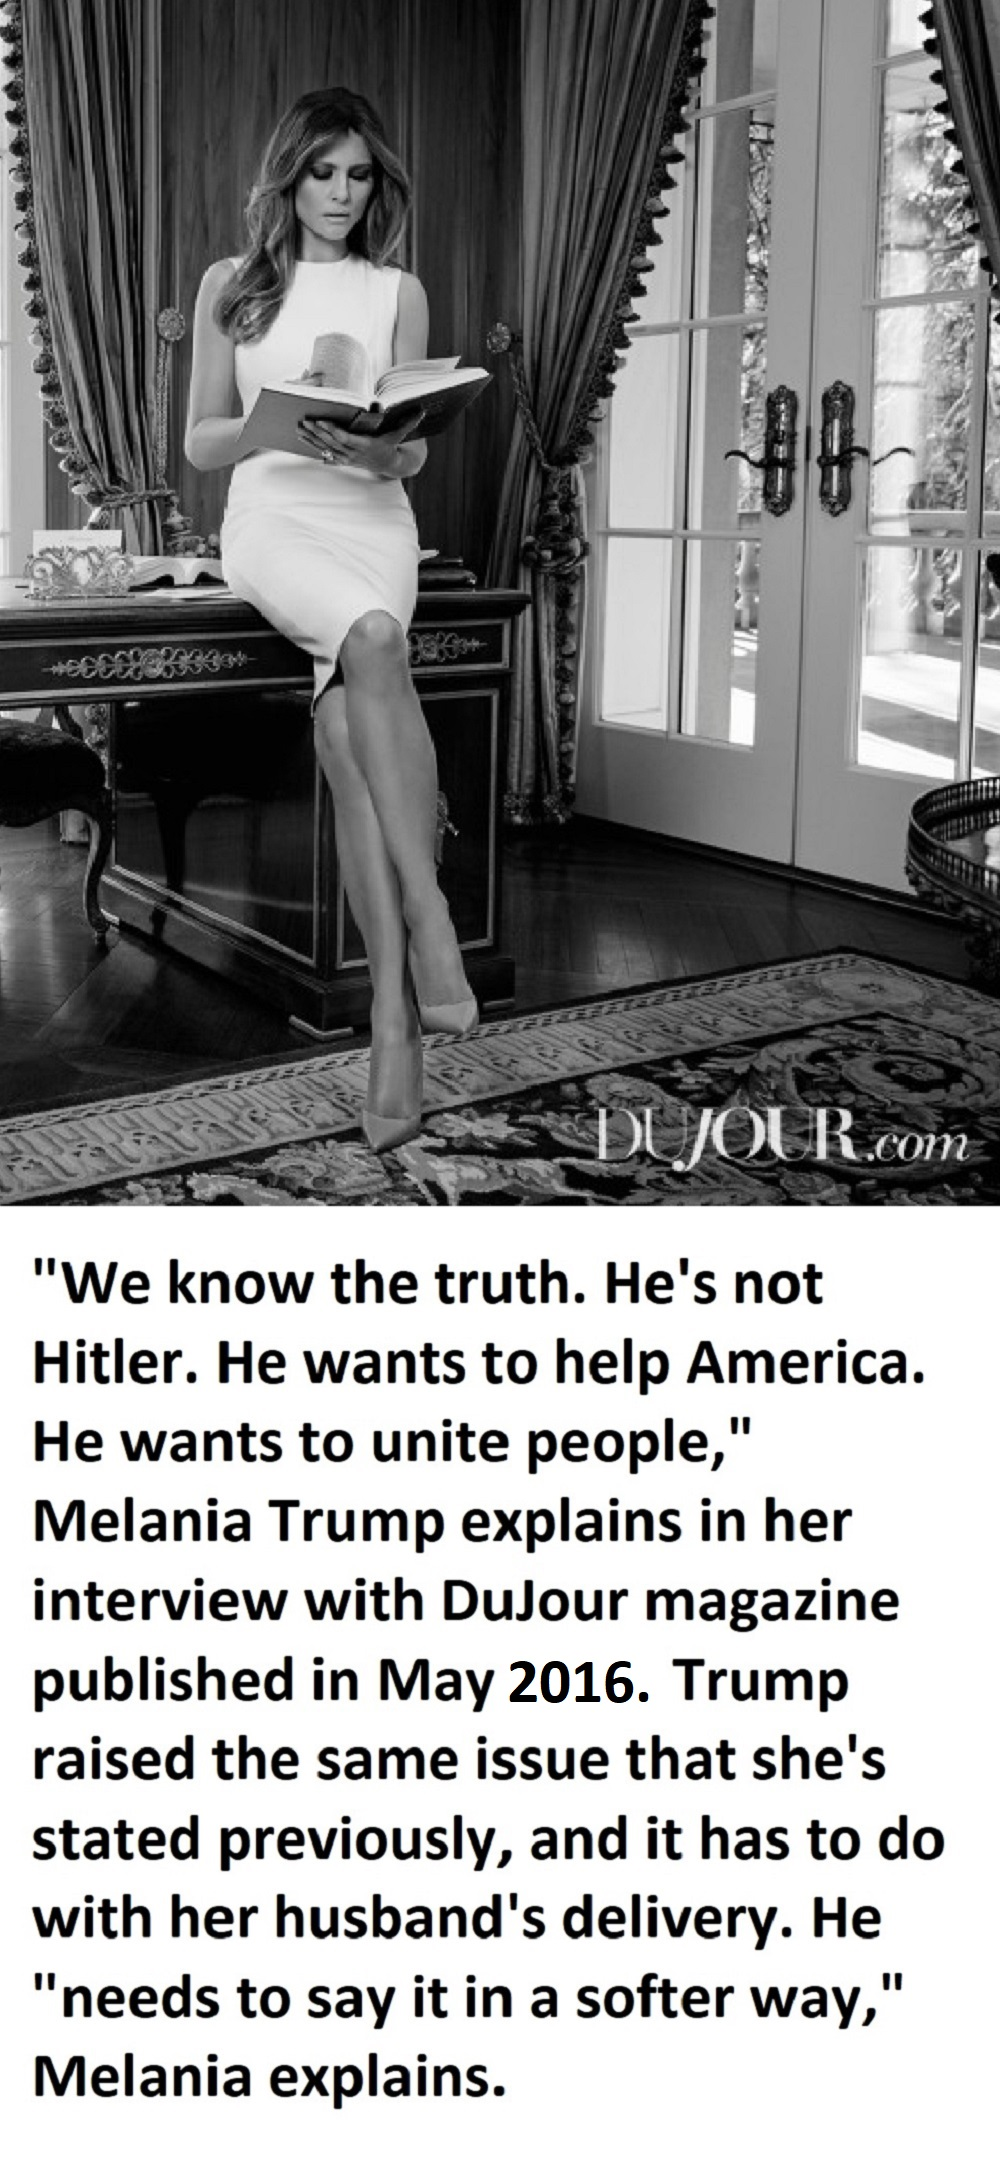 Melania Trump says Donald Trump is not Hitler text.jpg